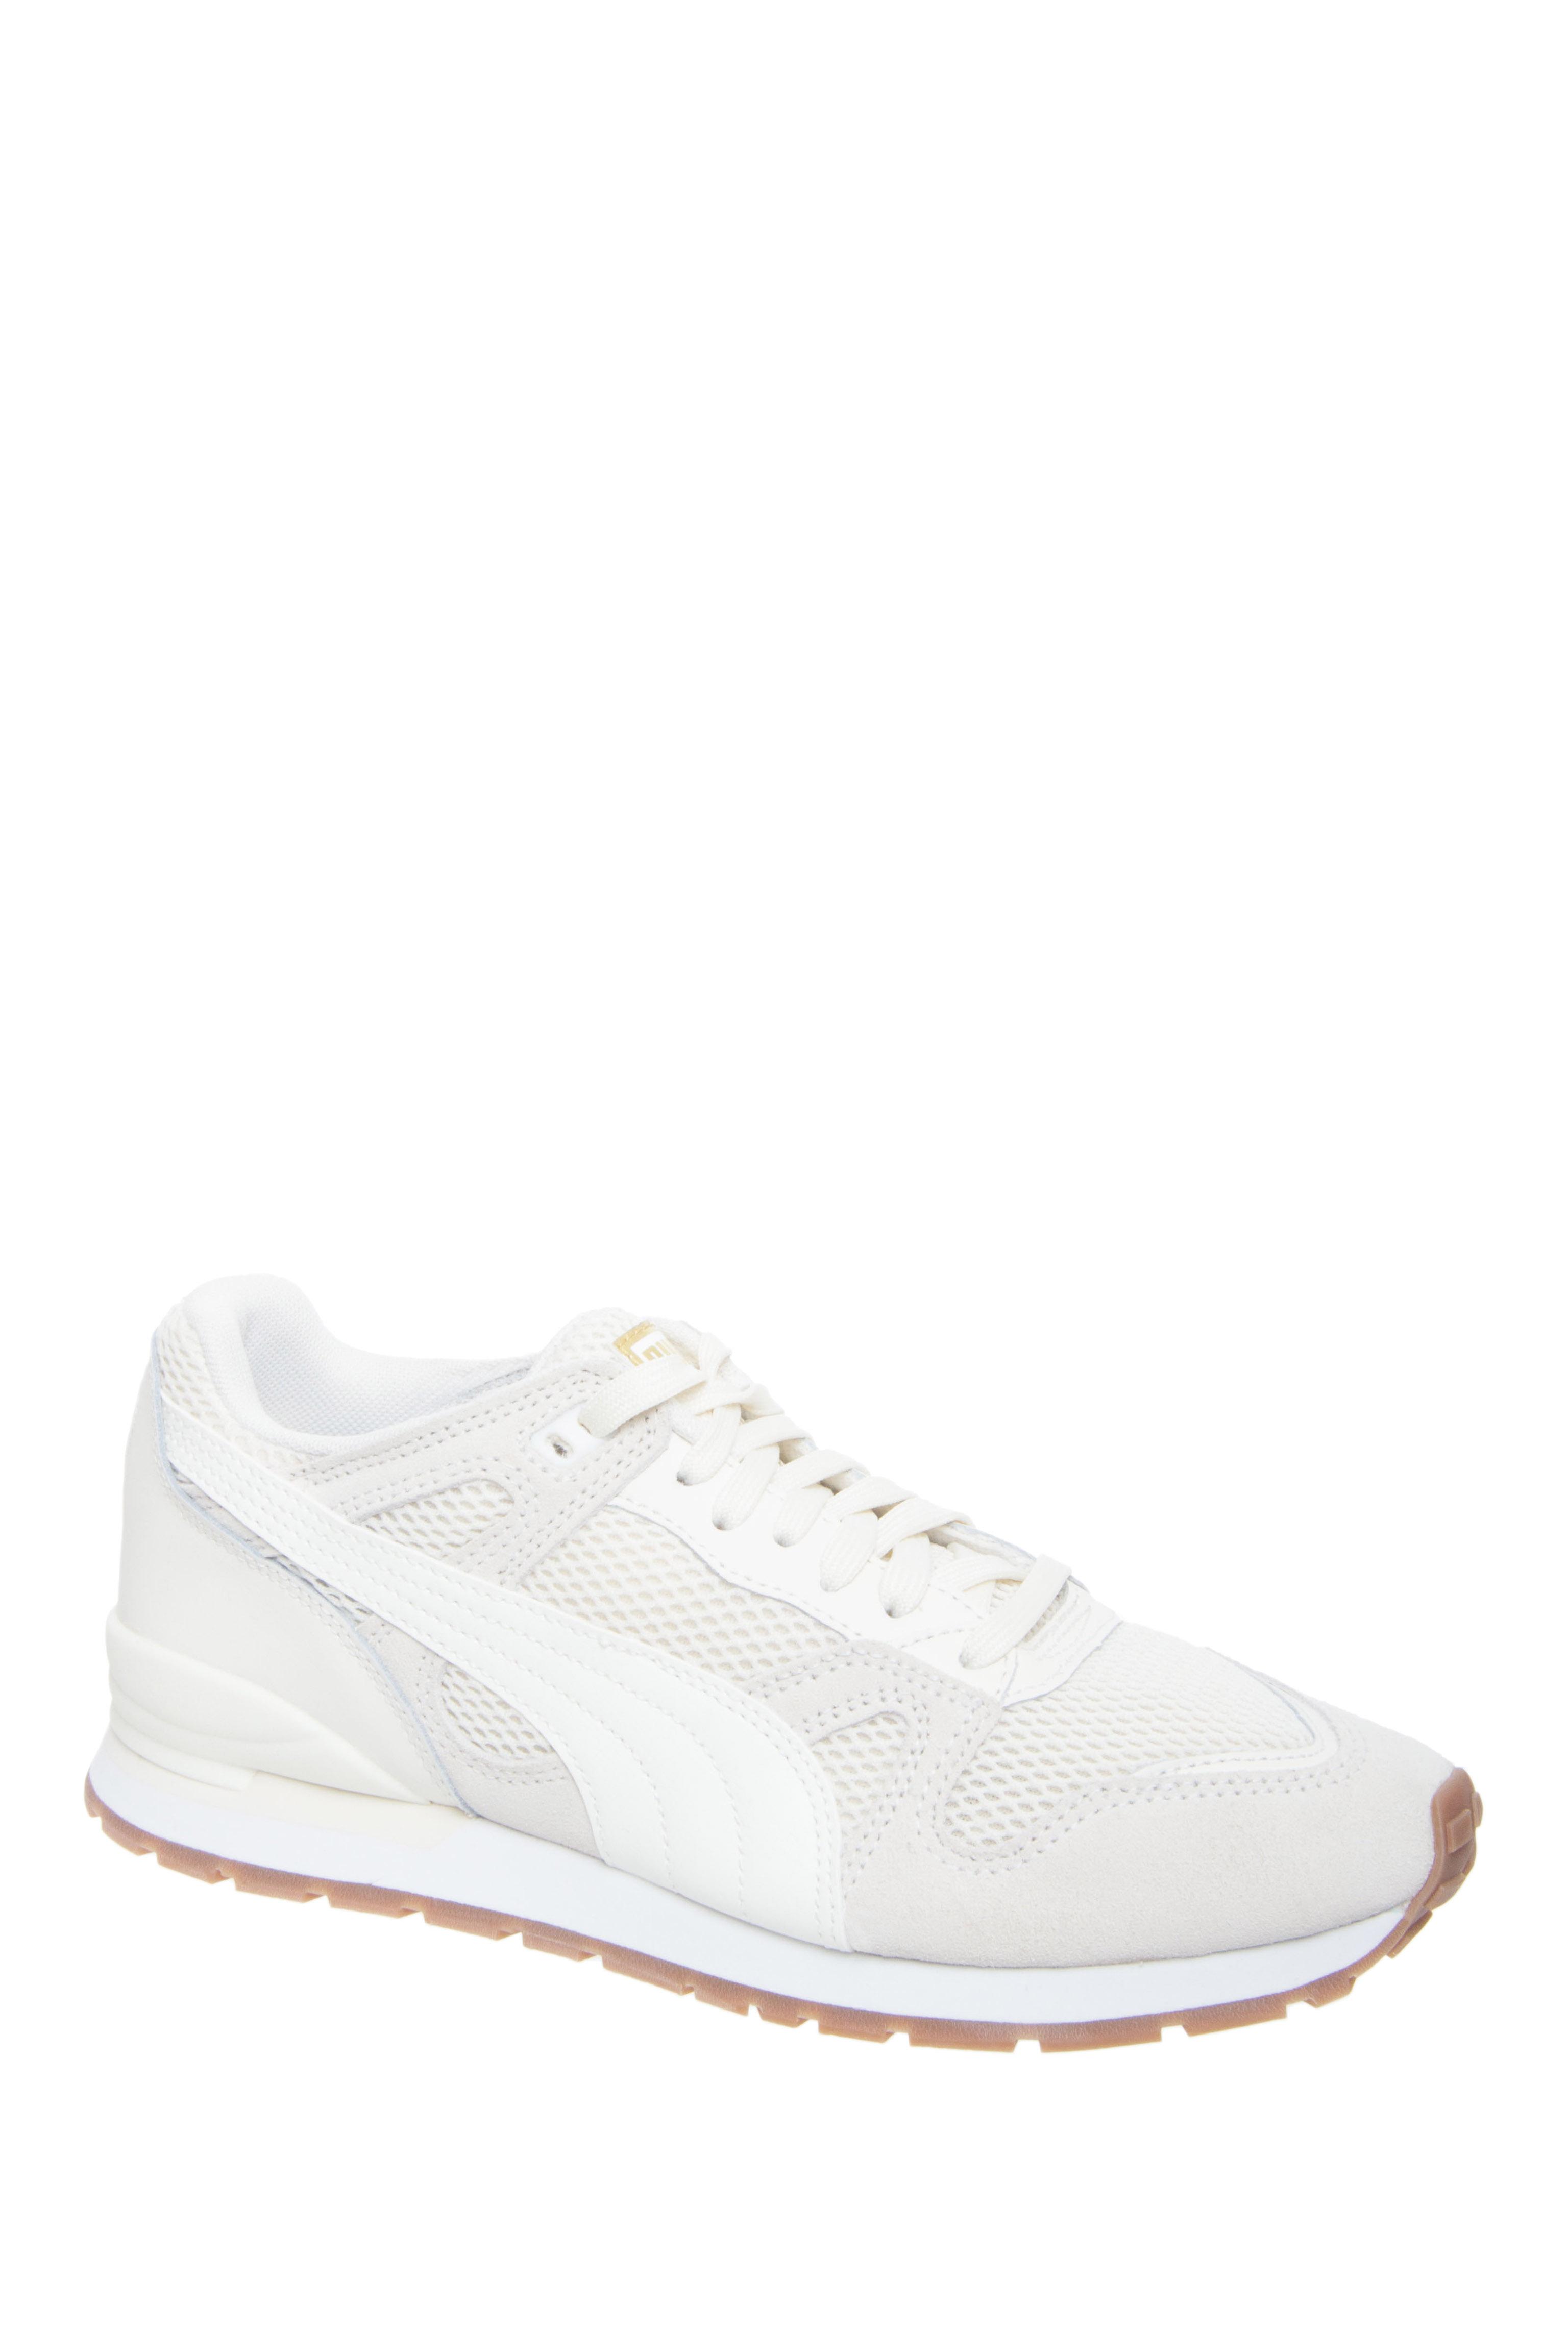 Puma Duplex OG x Careaux Low Top Sneakers - Whisper White